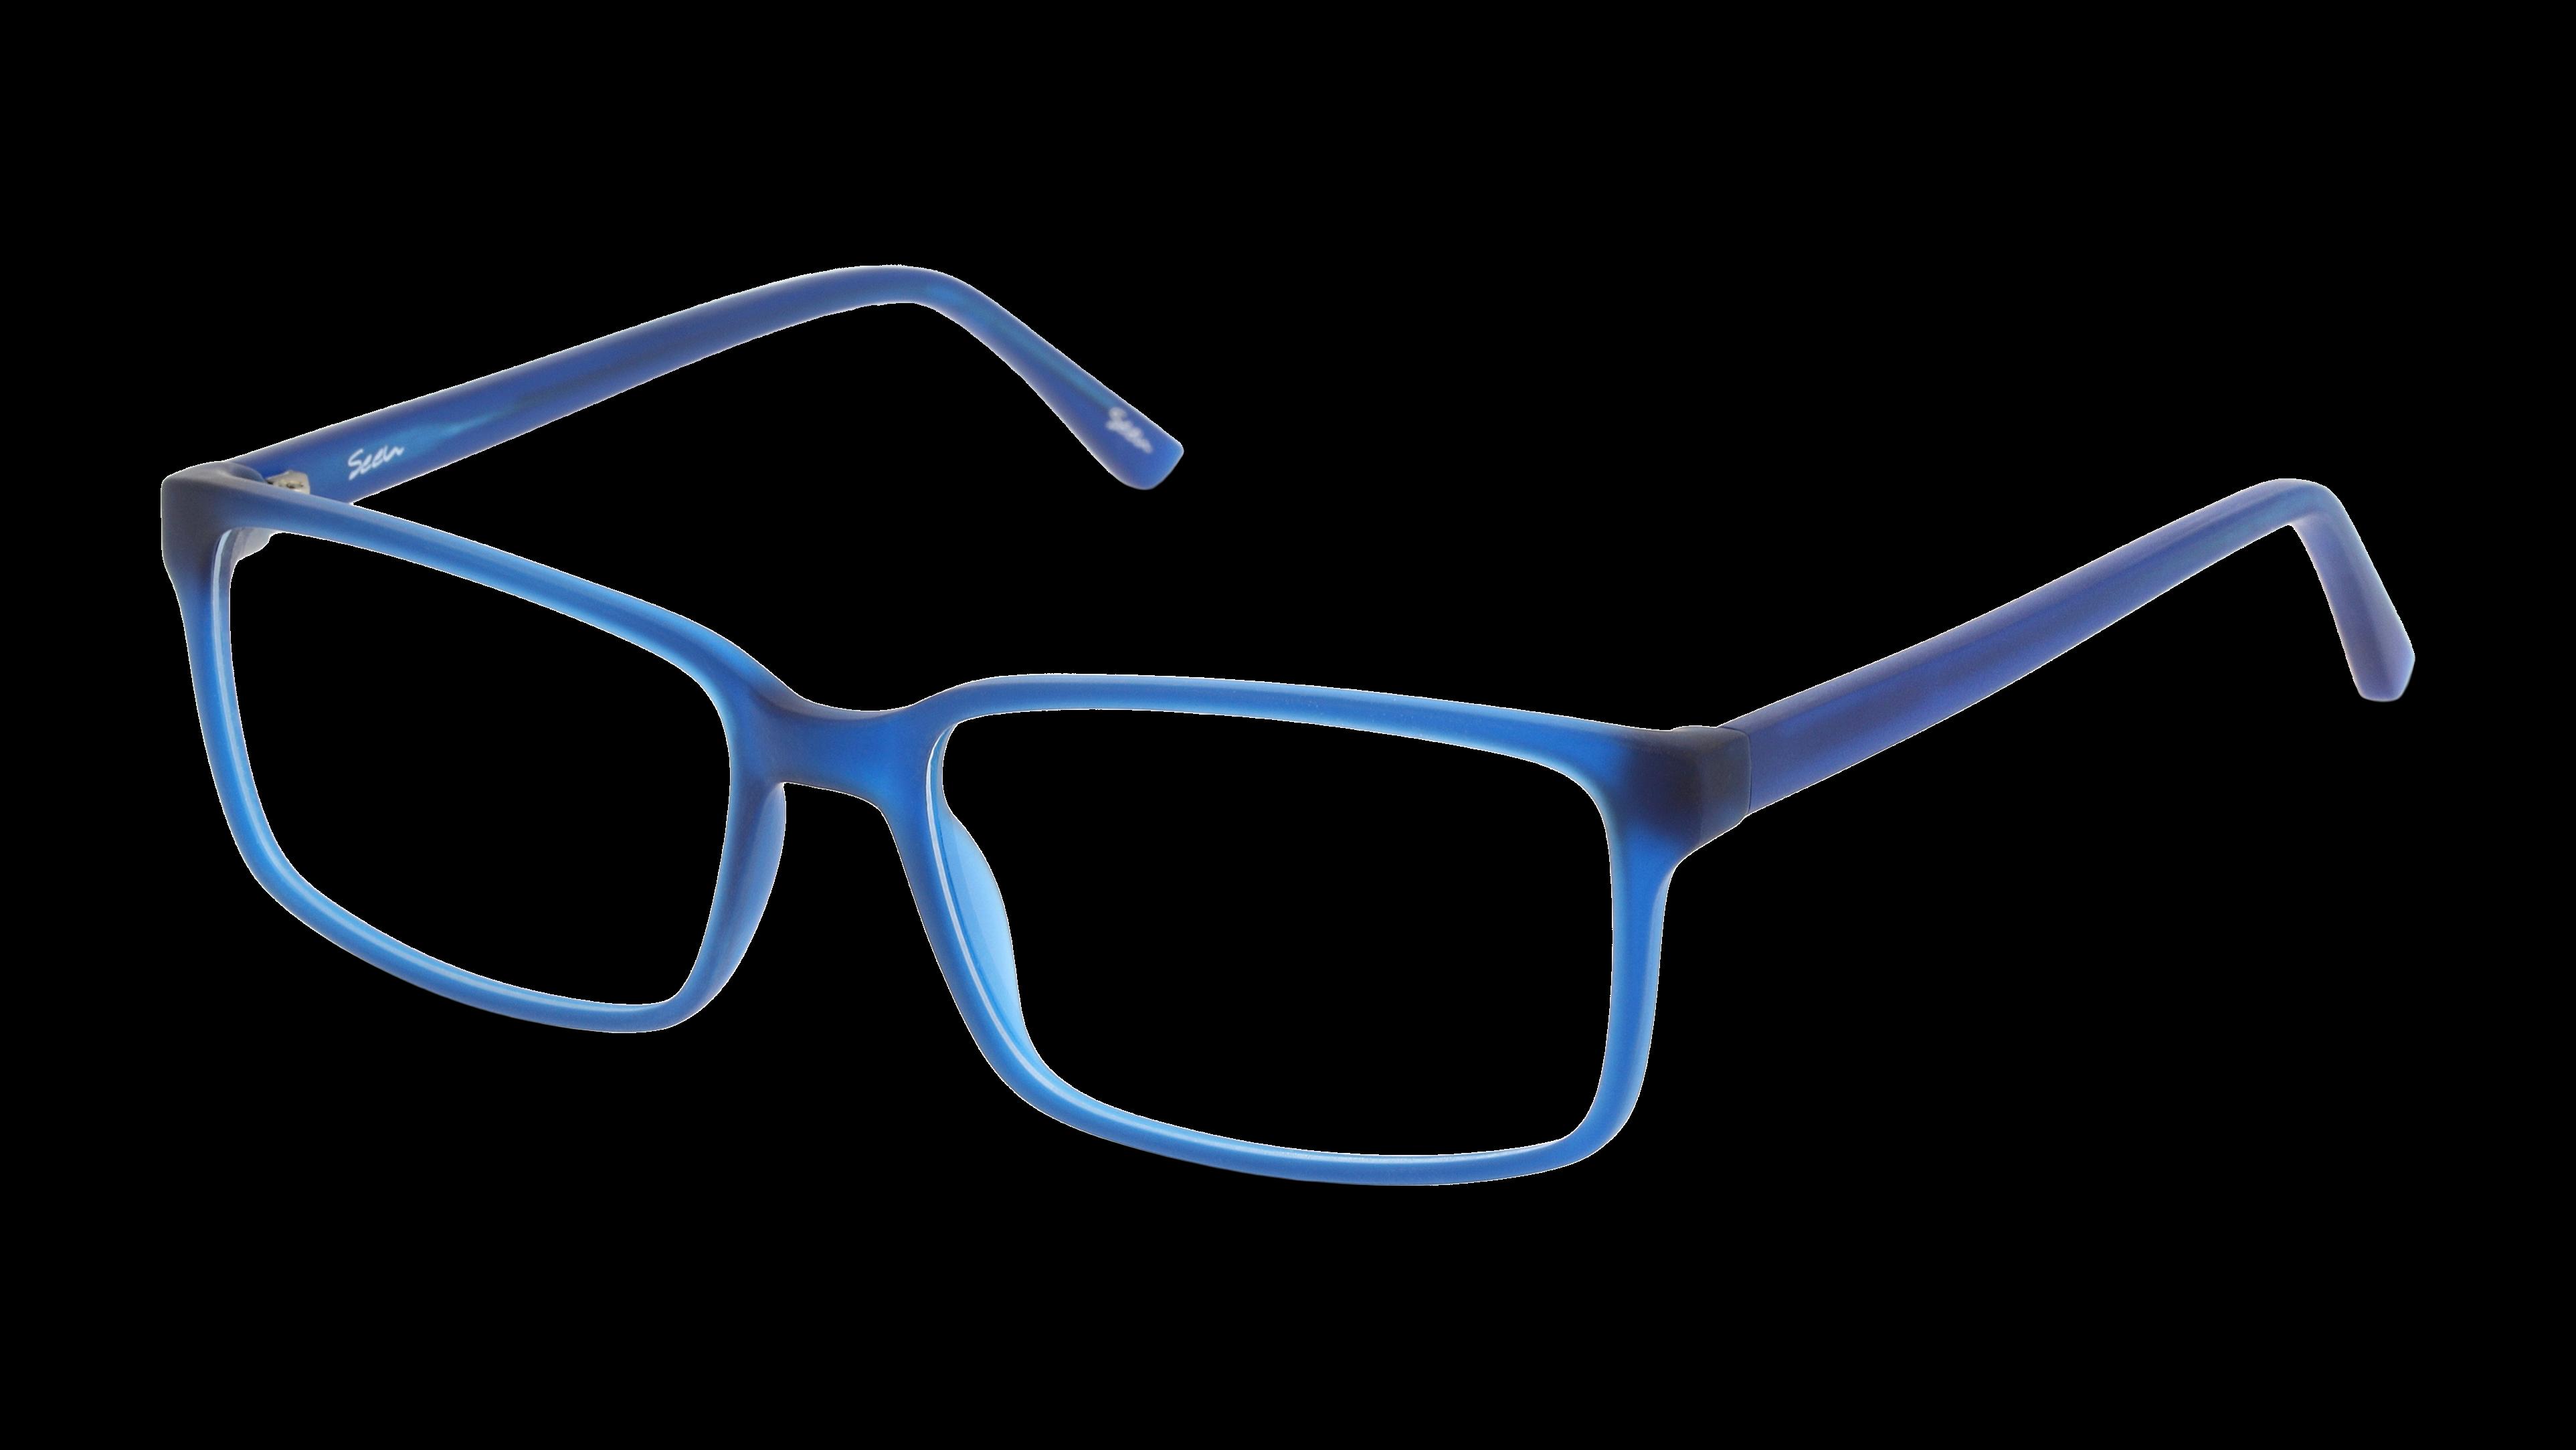 Angle_Left01 Seen Seen SNAM21 CX00 54/16 Blauw